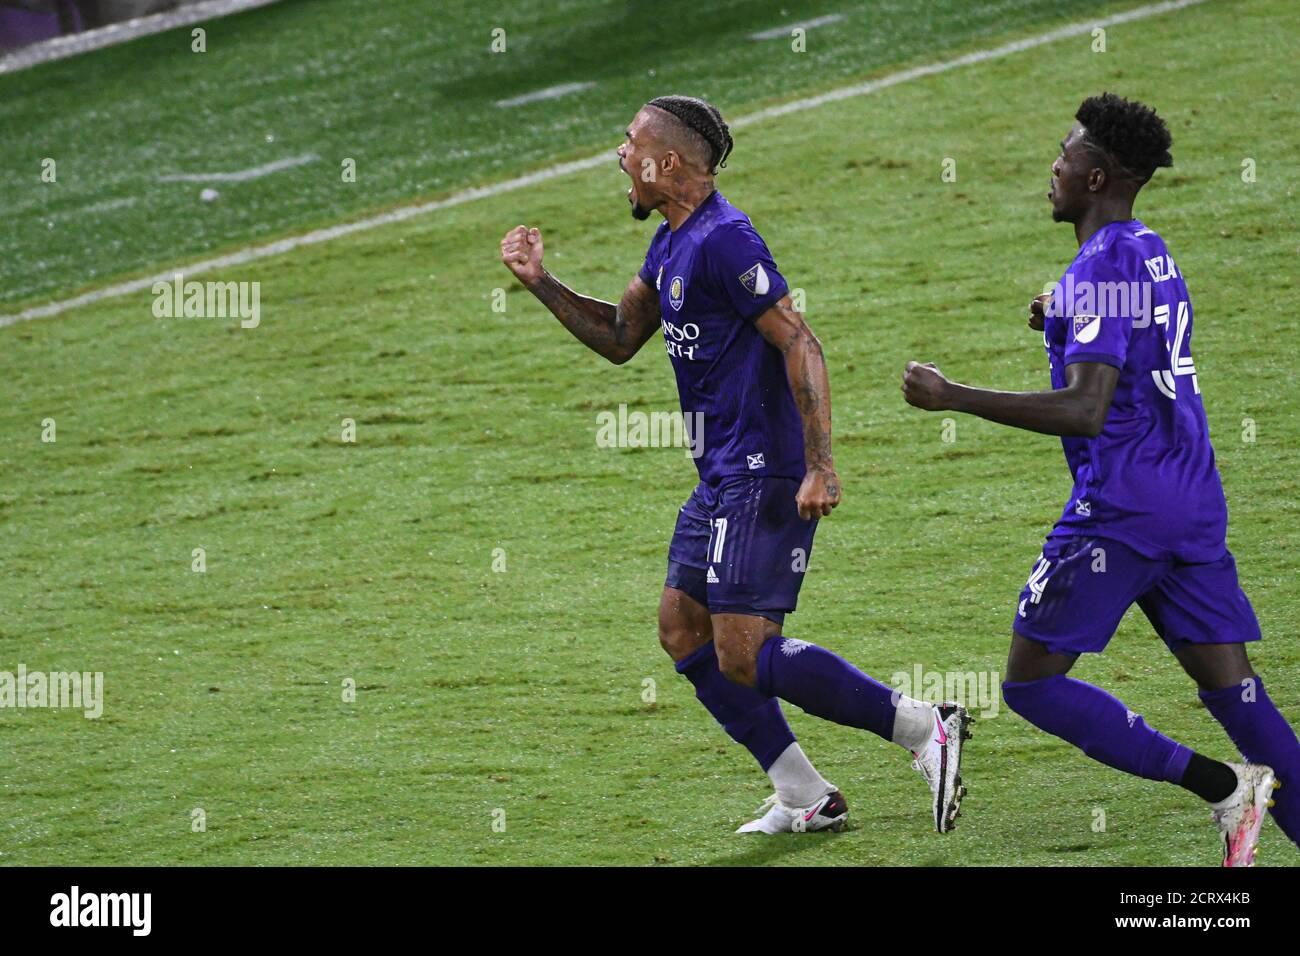 Orlando City SC midfielder Júnior Urso #11 celebrate goal at Exploria Stadium on Saturday September 19, 2020.   Photo Credit:  Marty Jean-Louis Stock Photo